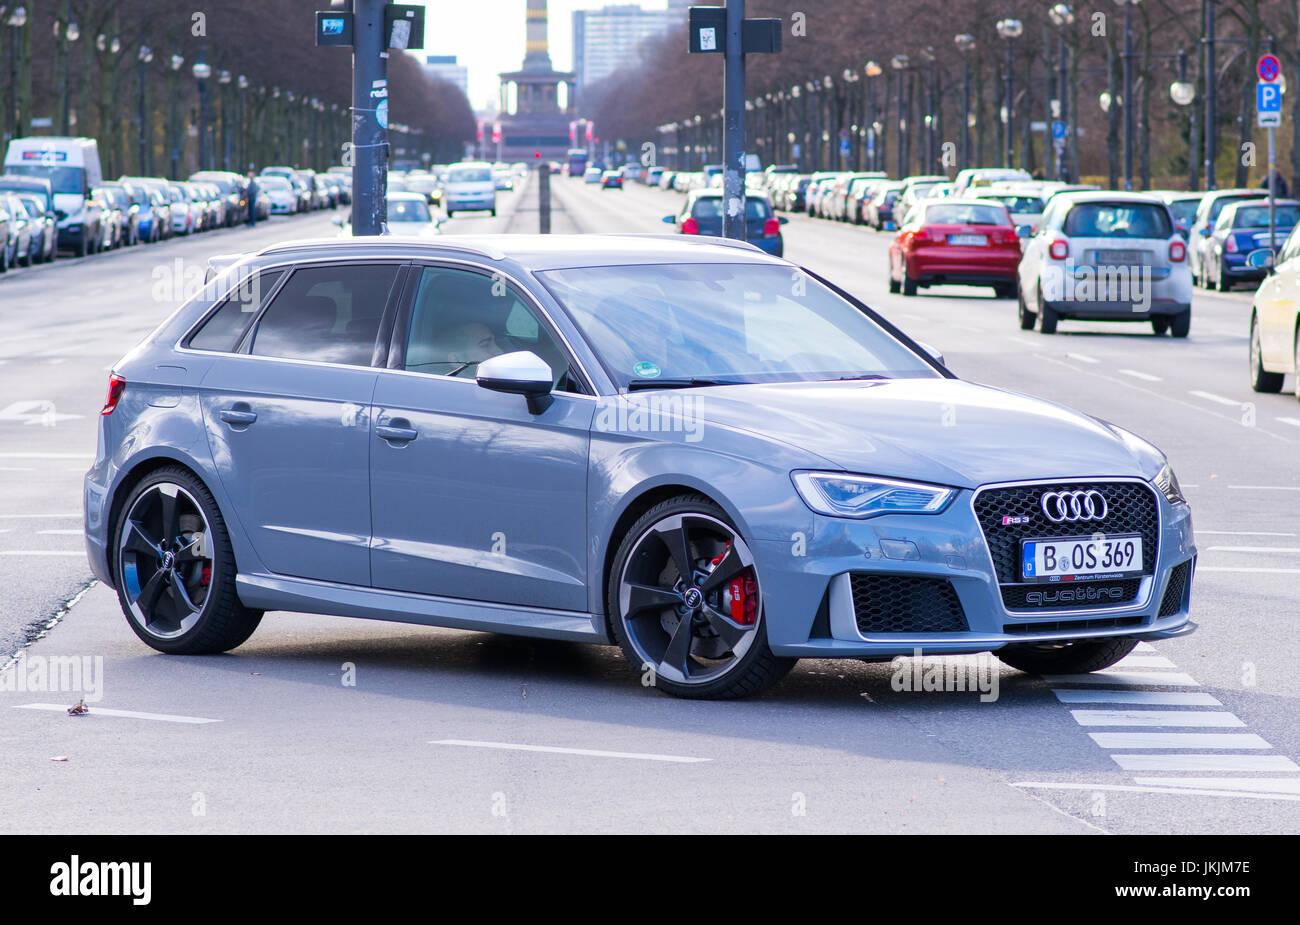 Shiney Audi Car - Berlin, Germany - Stock Image